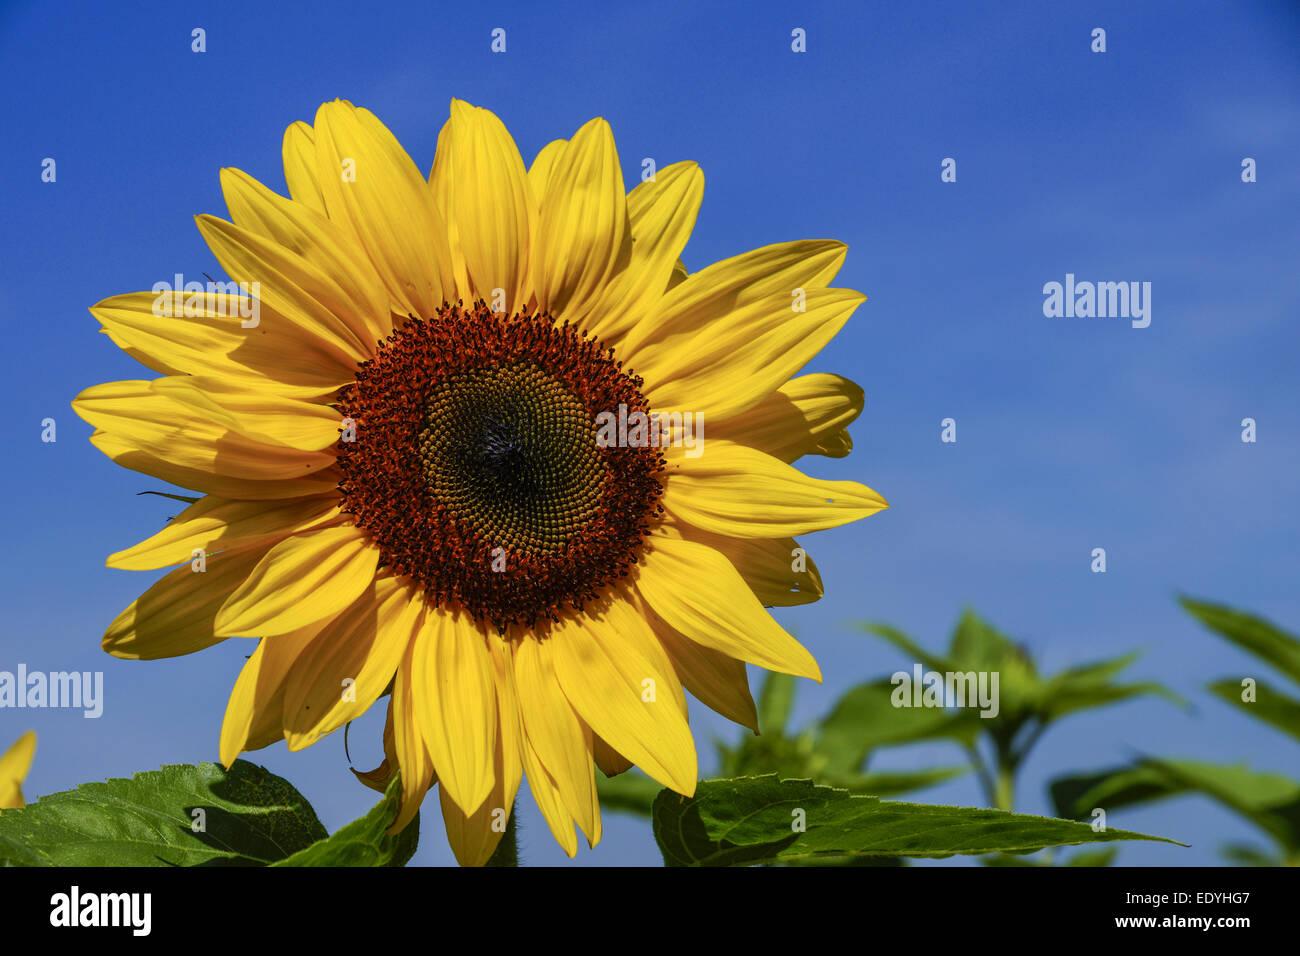 Sonnenblume, Helianthus annuus, Sonnenblumenfeld, Sunflower, sunflower field, Day, Sunny, Nobody, Bright, Agriculture, - Stock Image